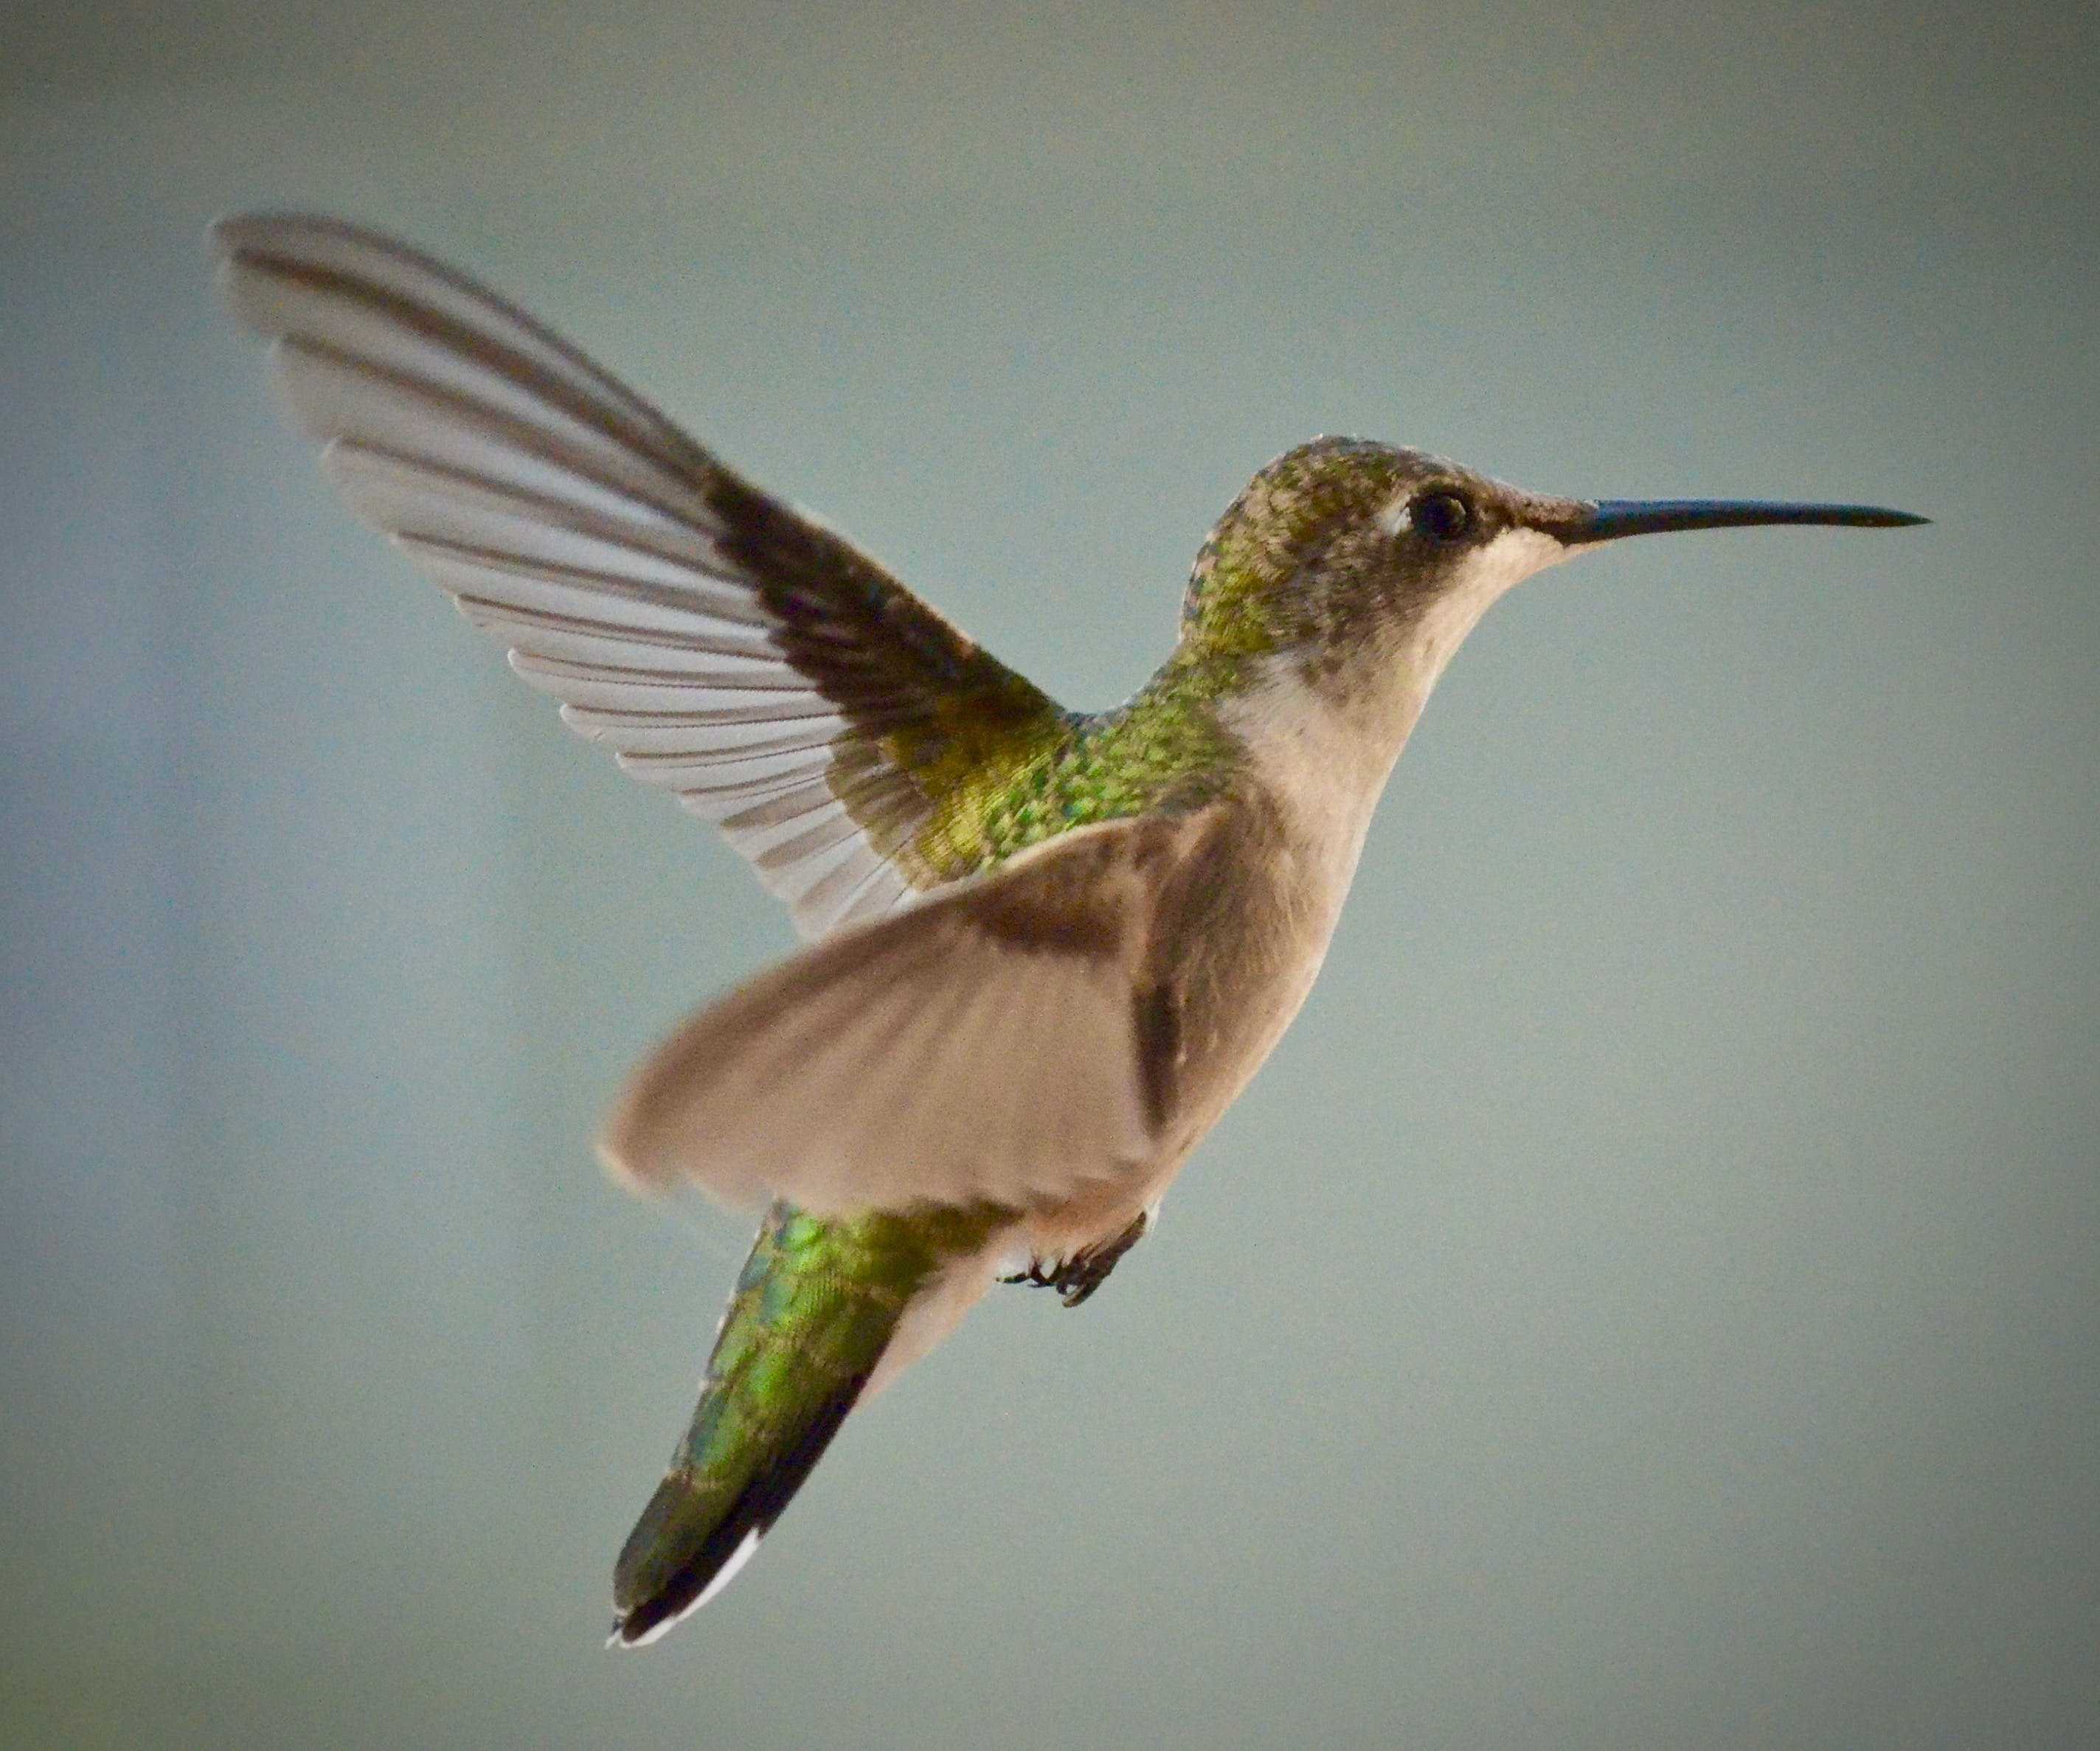 Green And Brown Hummingbird